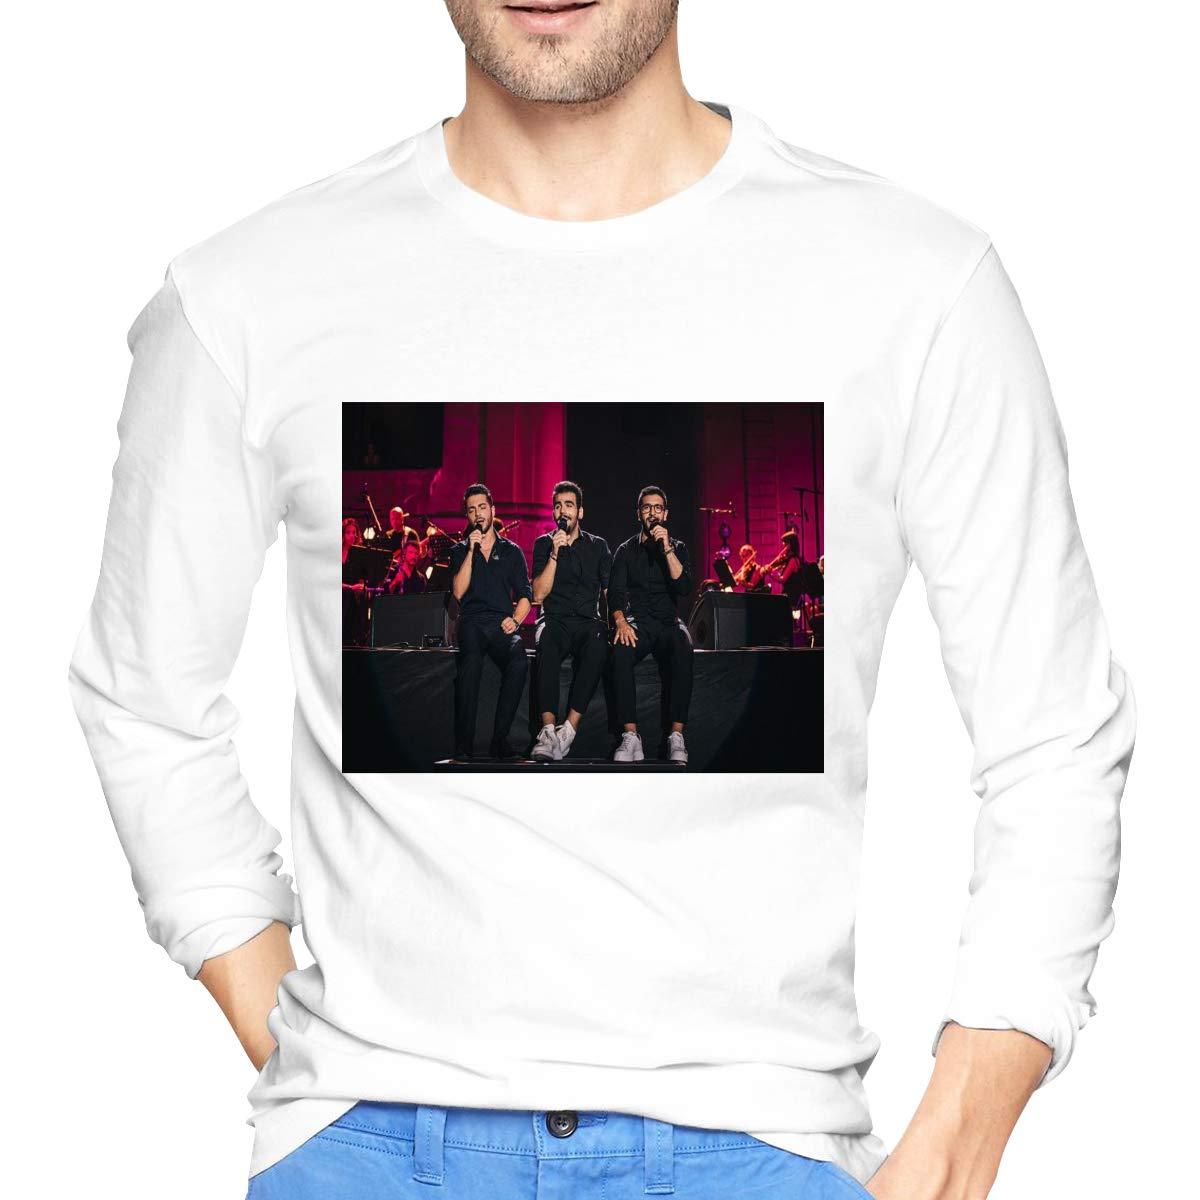 Lihehen Mans Il Volo Retro Printing Round Neck Ts Shirts